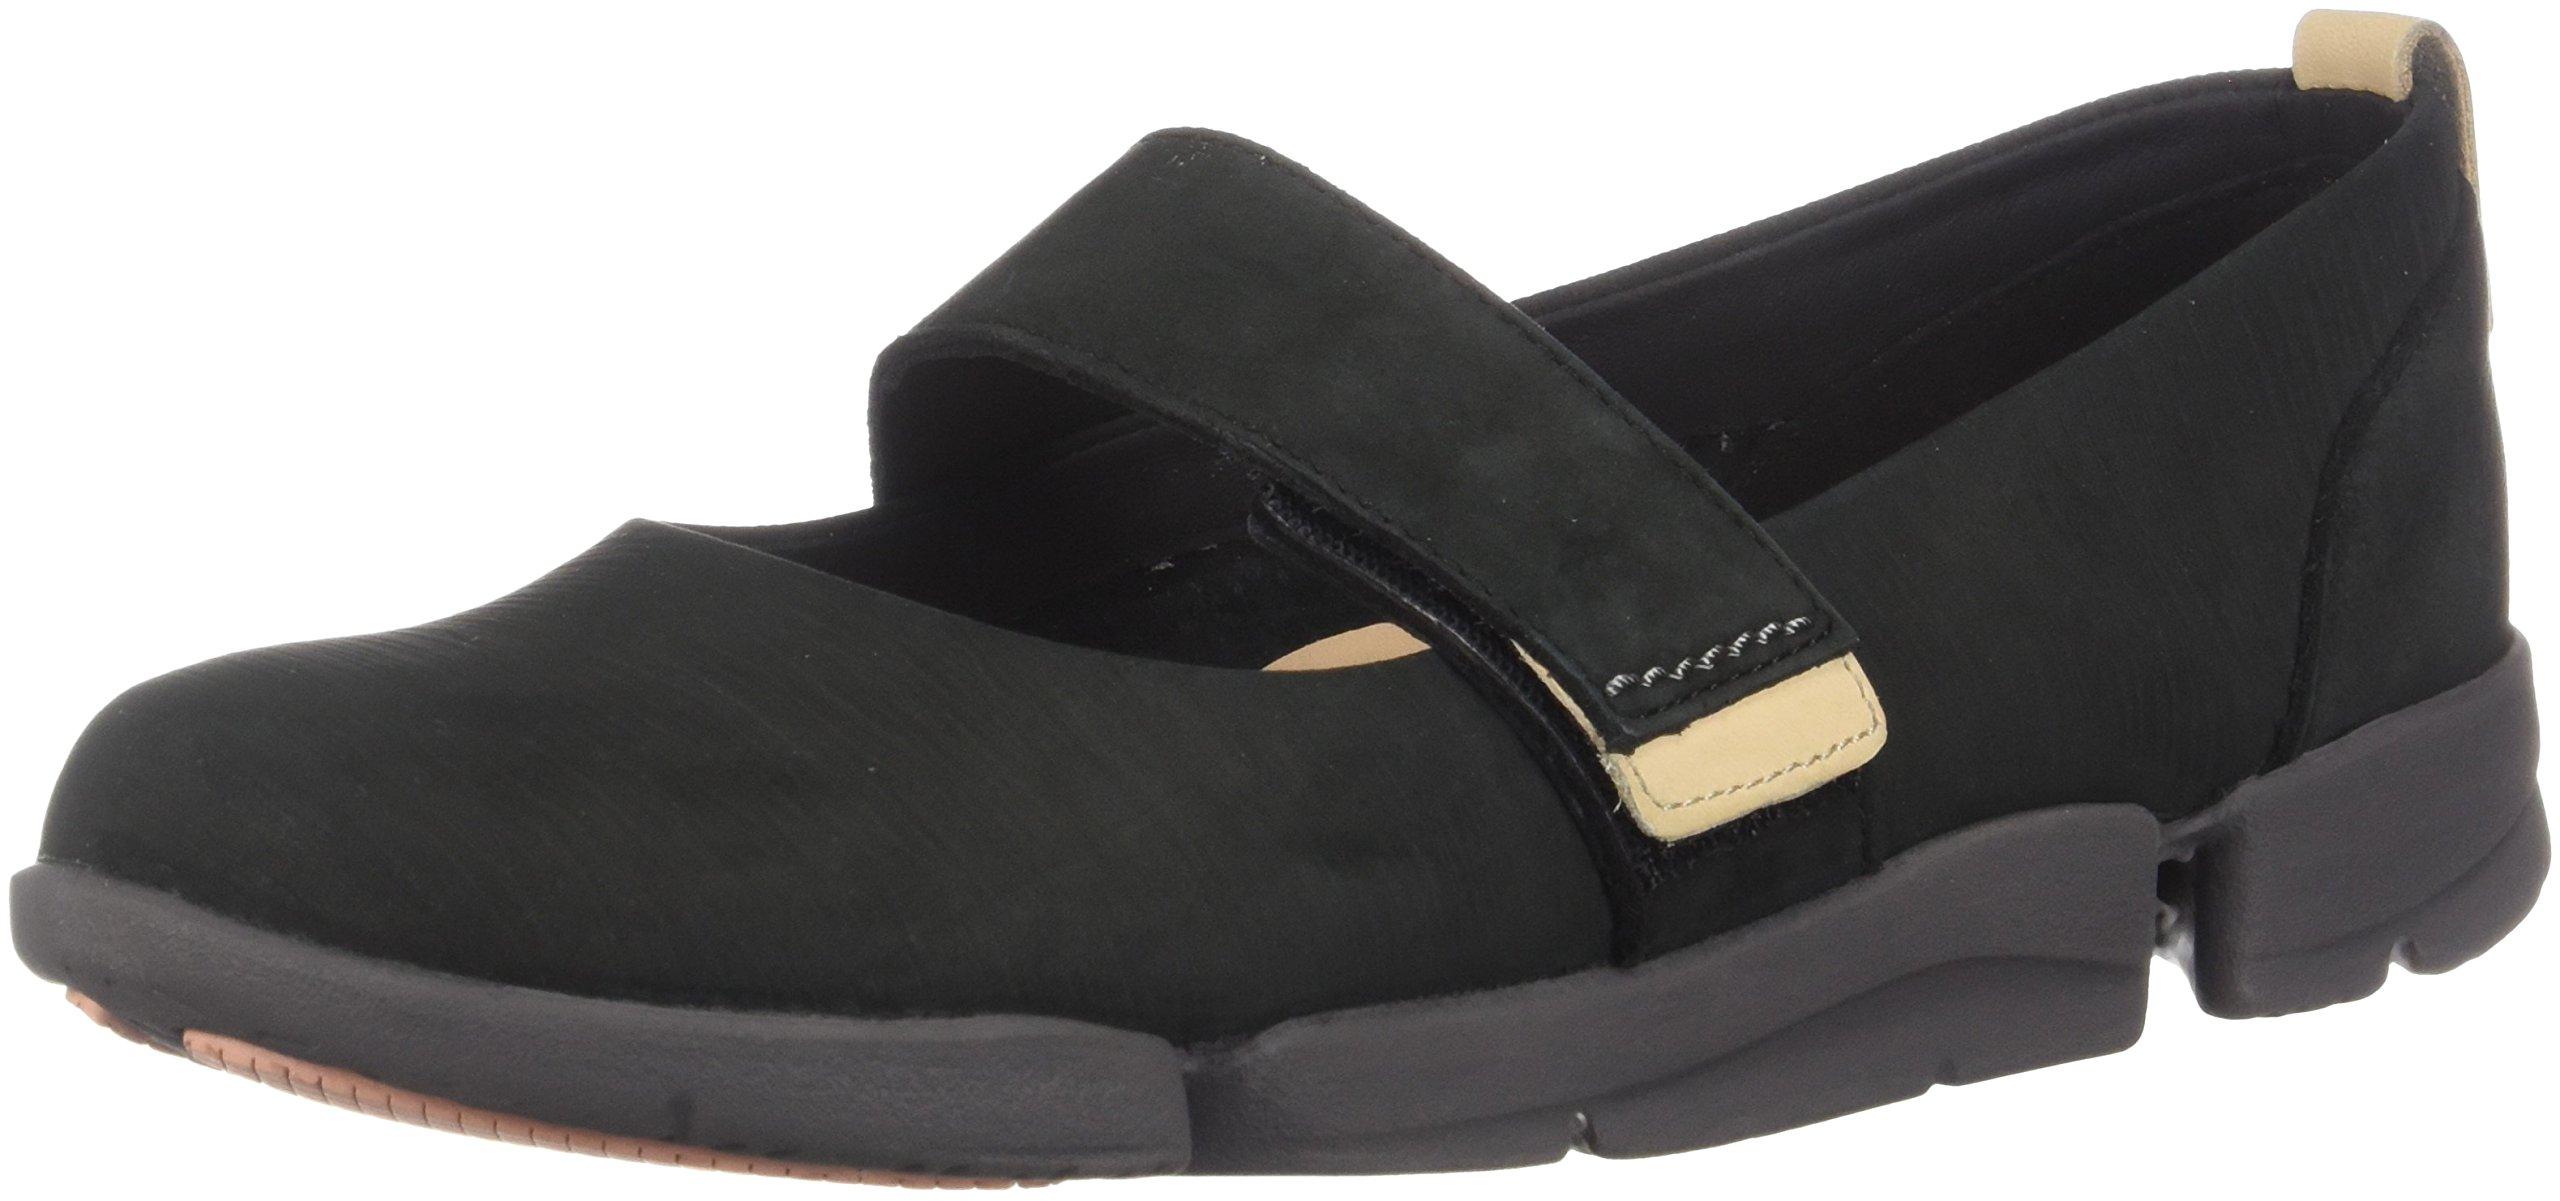 CLARKS Womens Tri Carrie Sneaker, Black Nubuck, Size 7